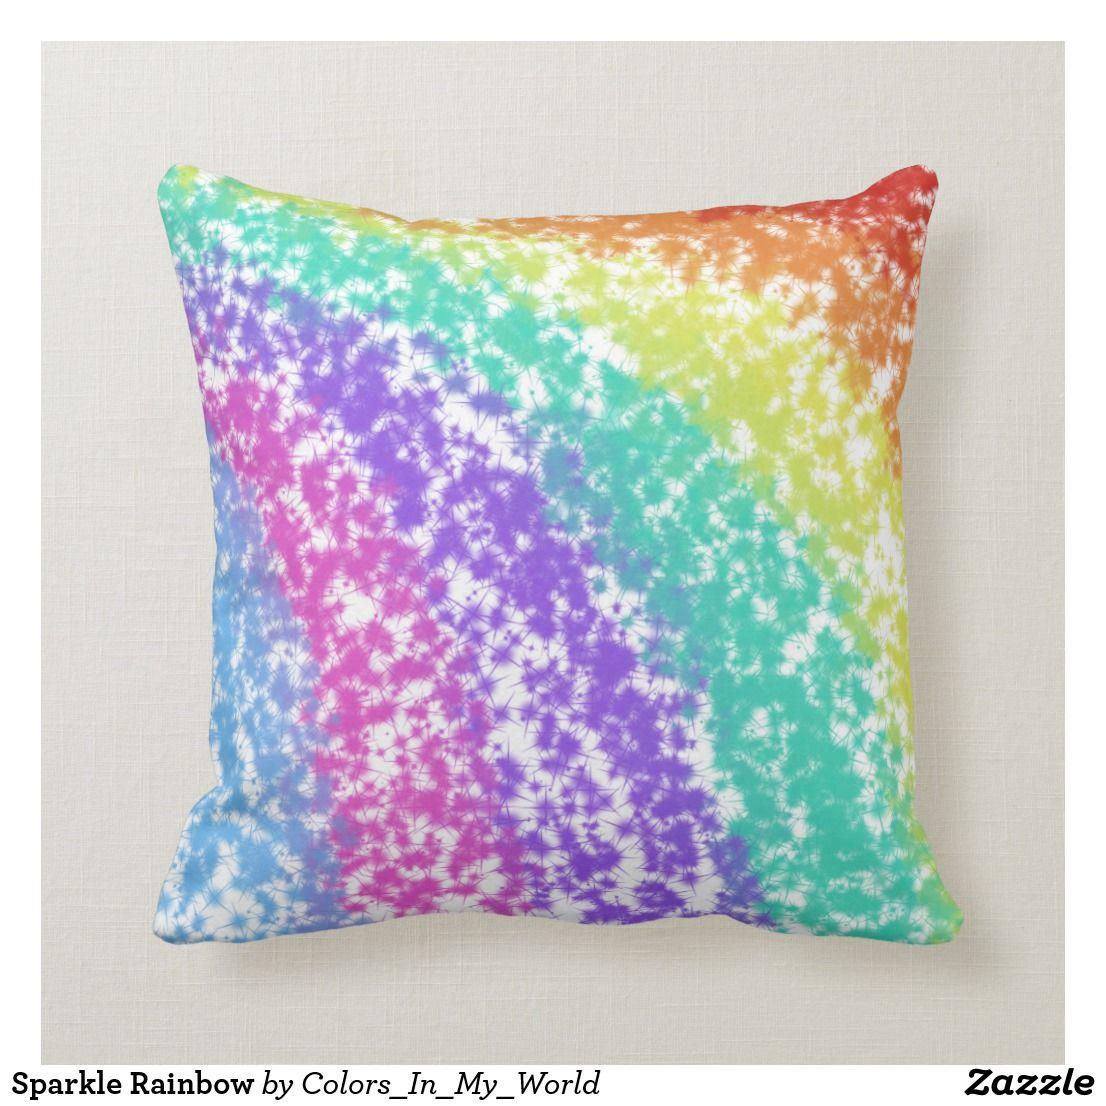 Astounding Sparkle Rainbow Throw Pillow Zazzle Com Zazzle Pillow Uwap Interior Chair Design Uwaporg